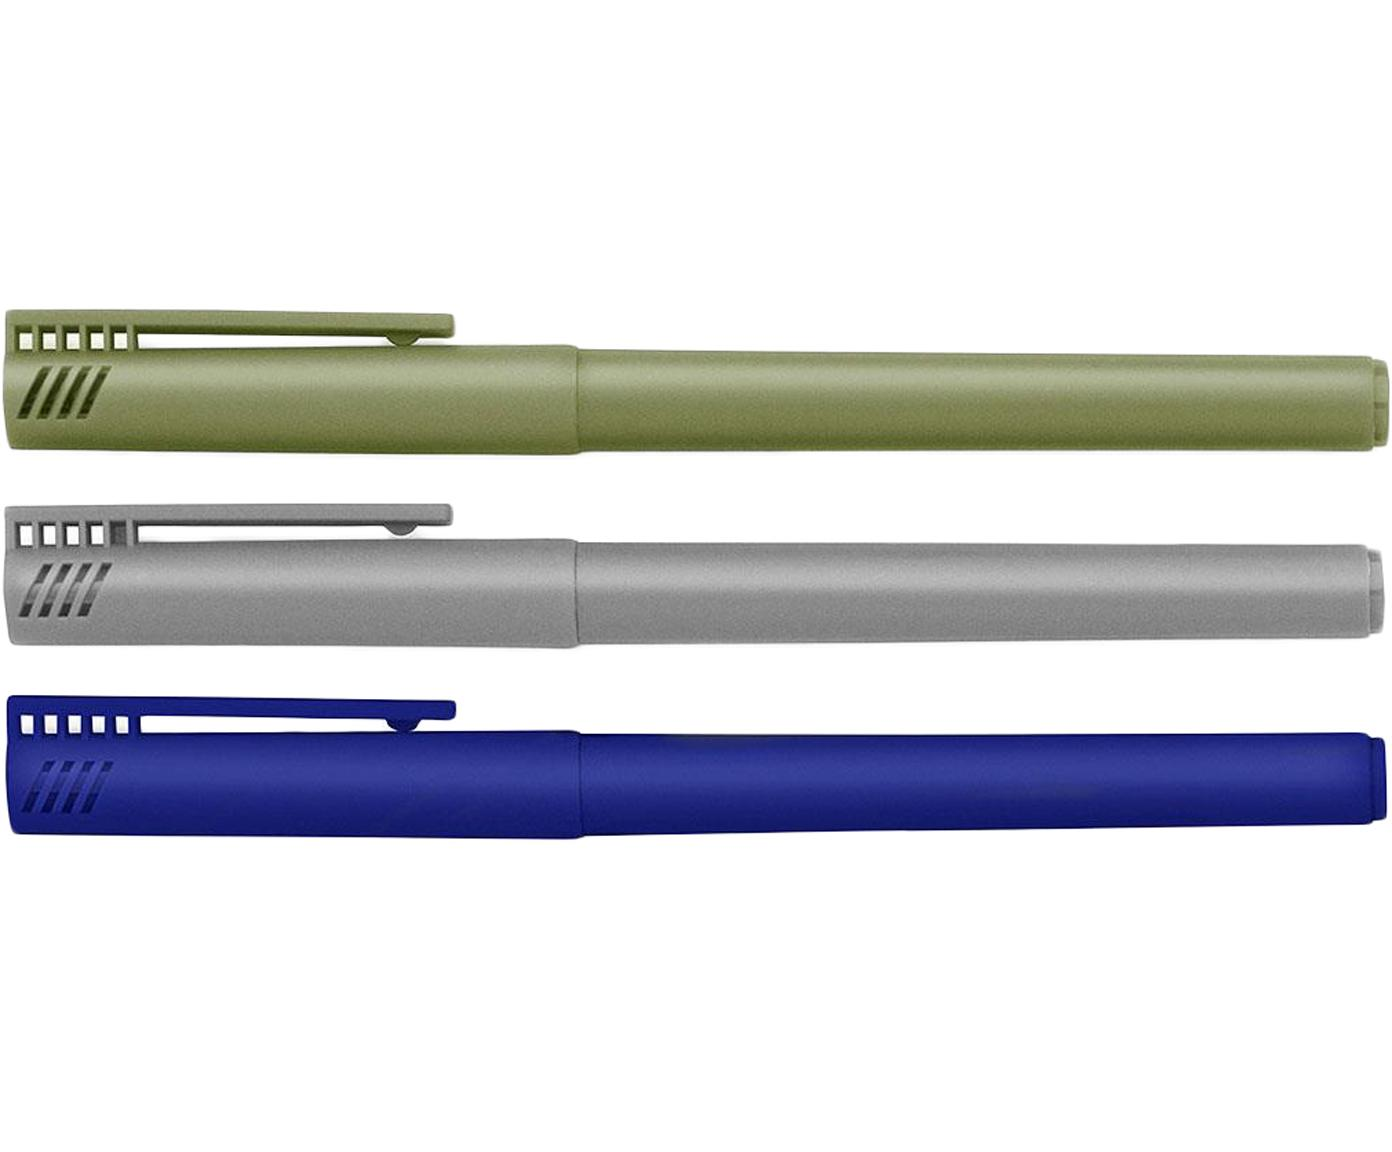 Fineliner-Set Mix, 3-tlg., Kunststoff, Blau, Grau, Grün, L 14 cm